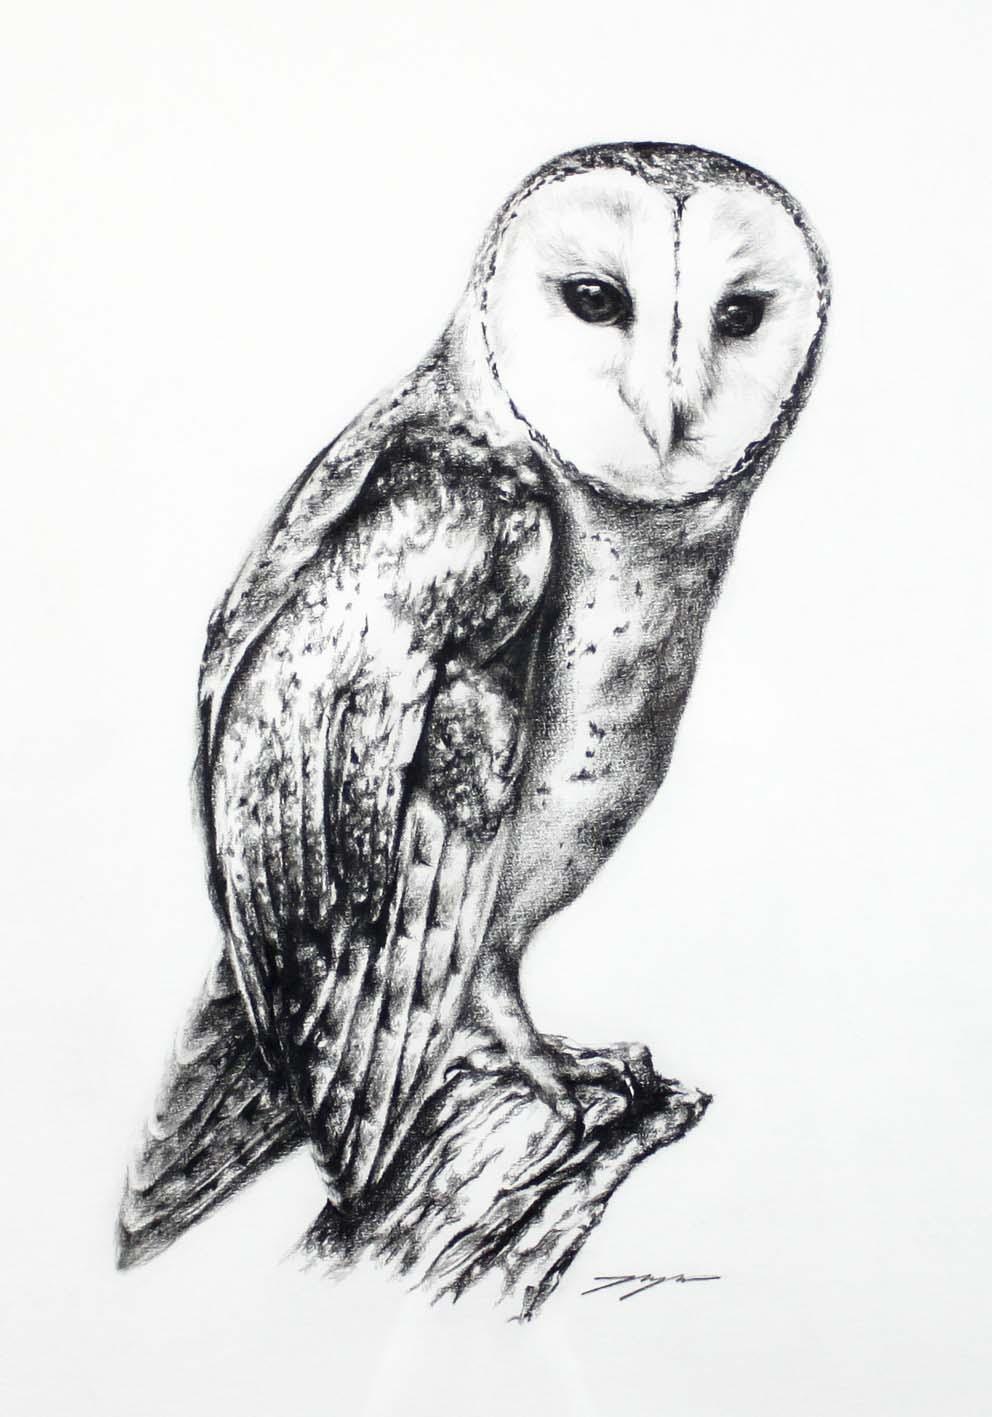 Jahne Meyer,  Masked Owl , oil charcoal on paper